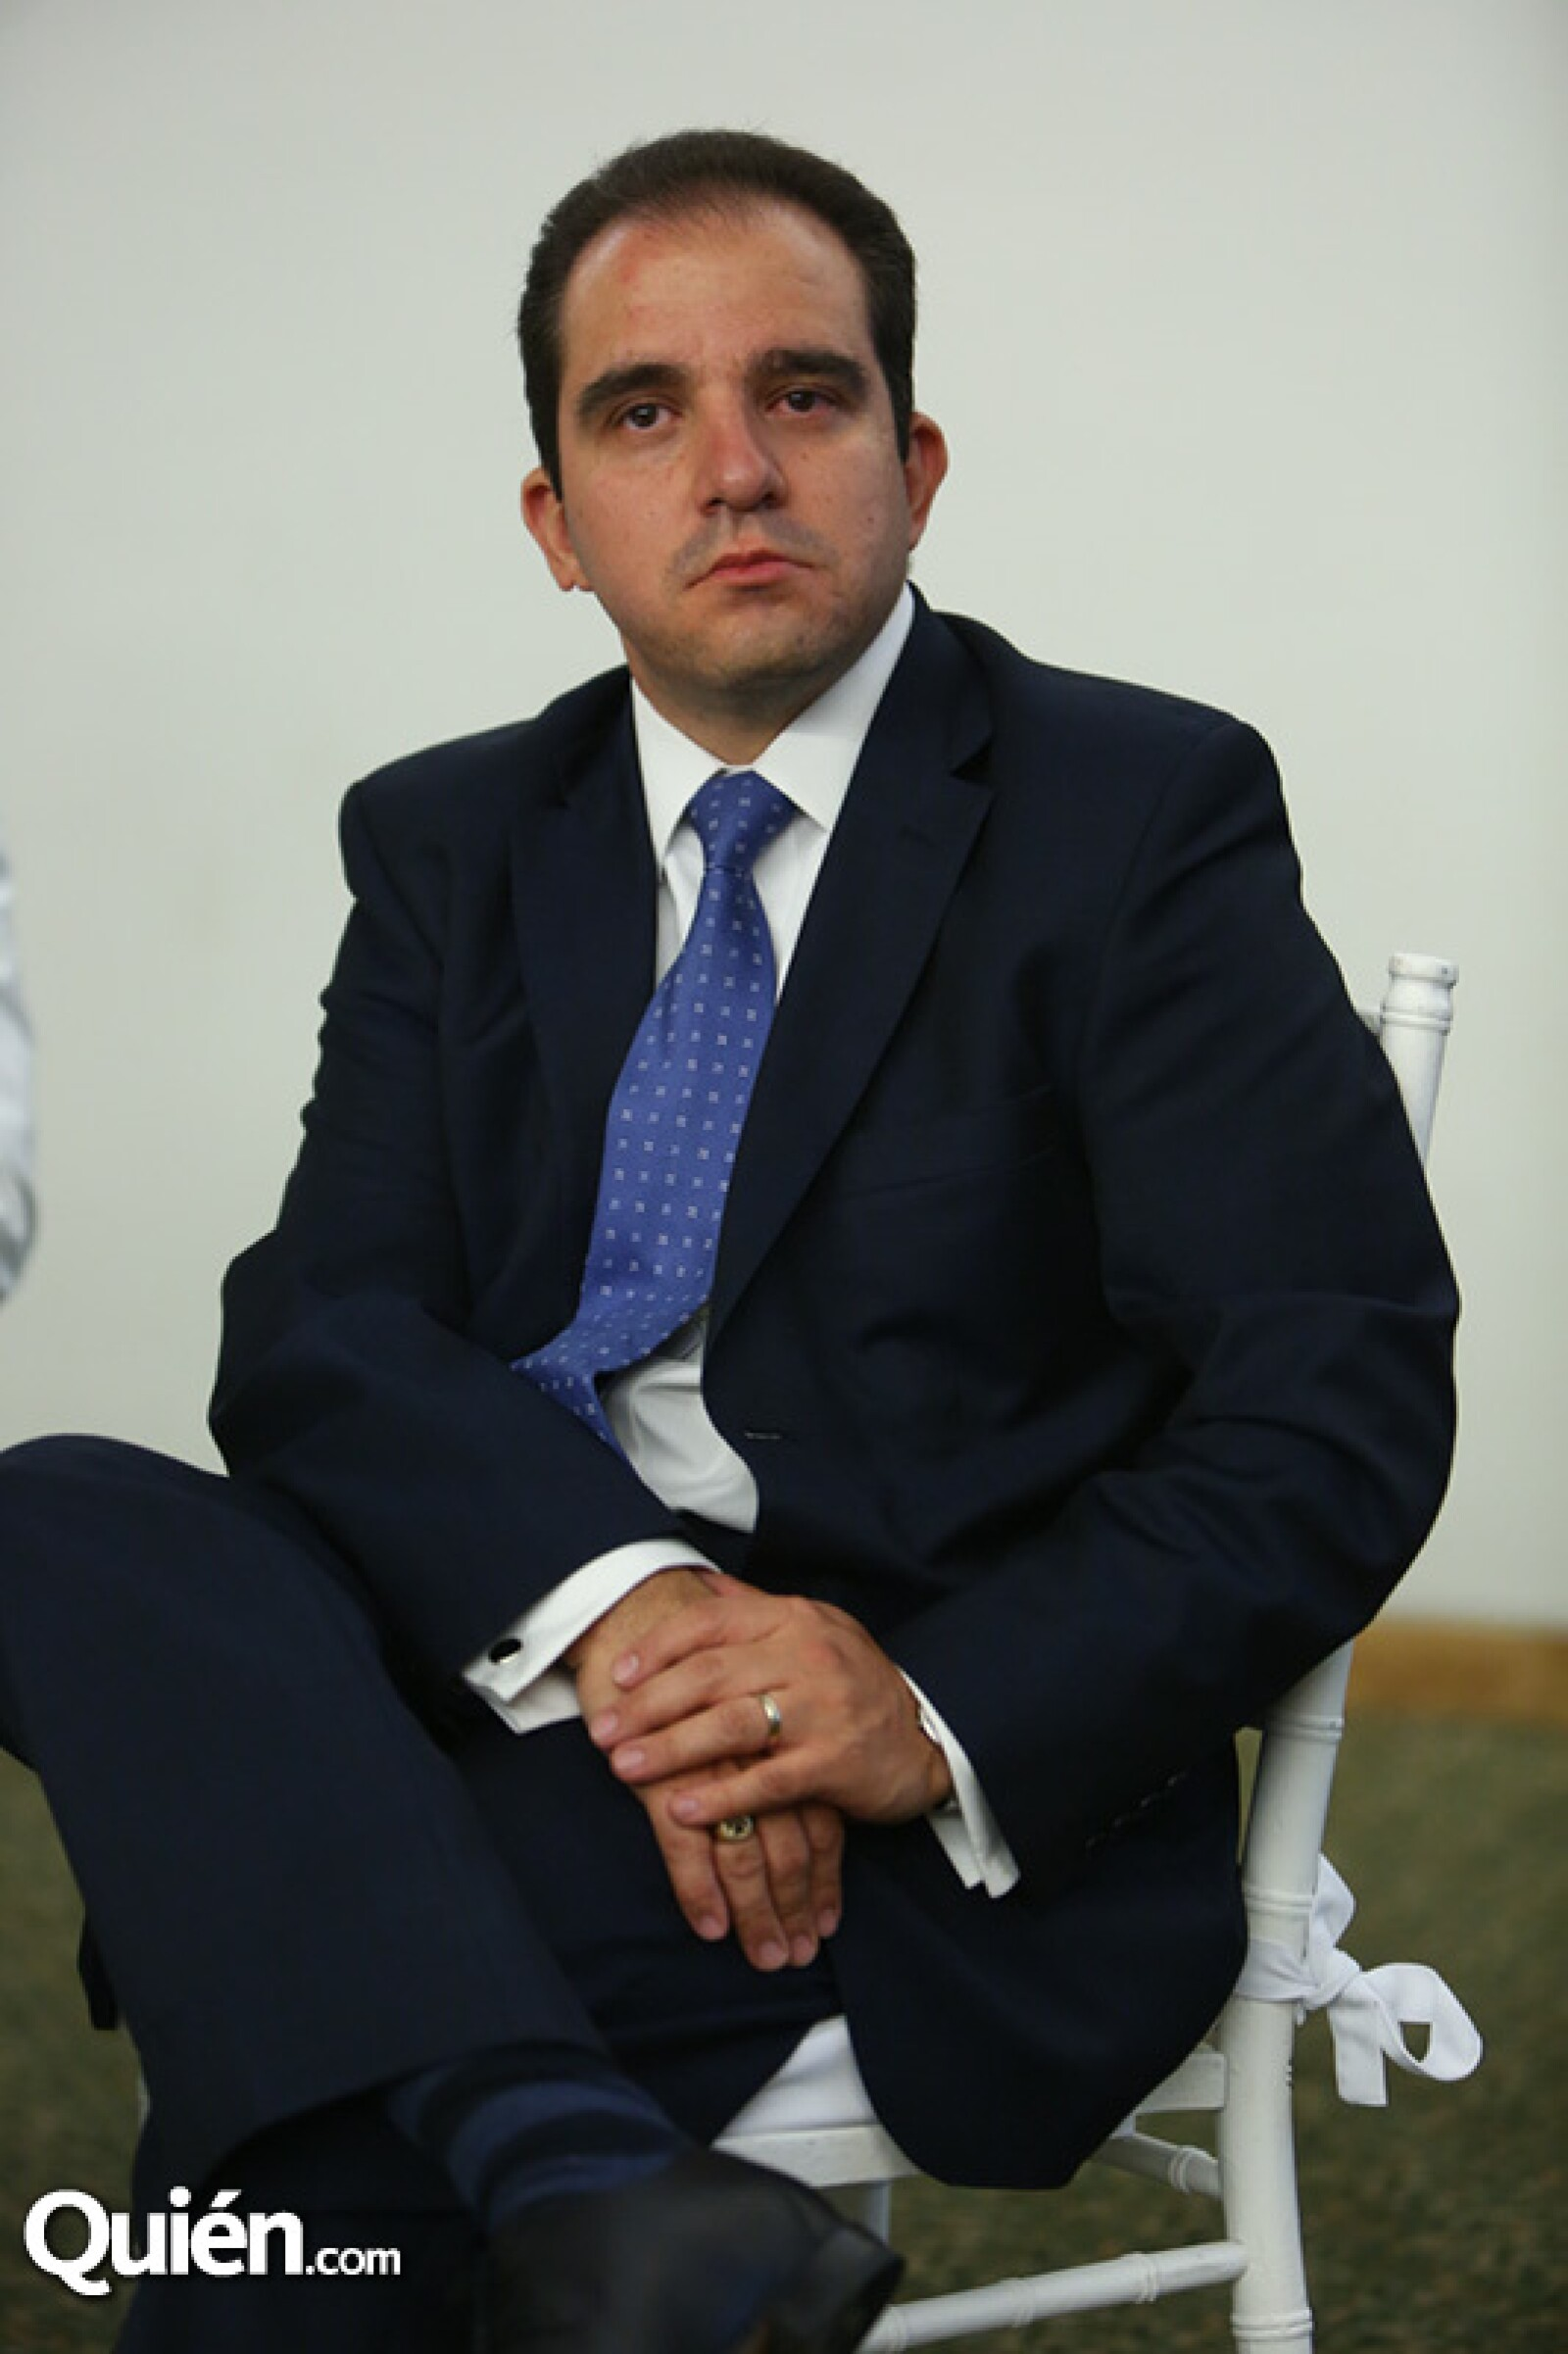 Marco Antonio Malo